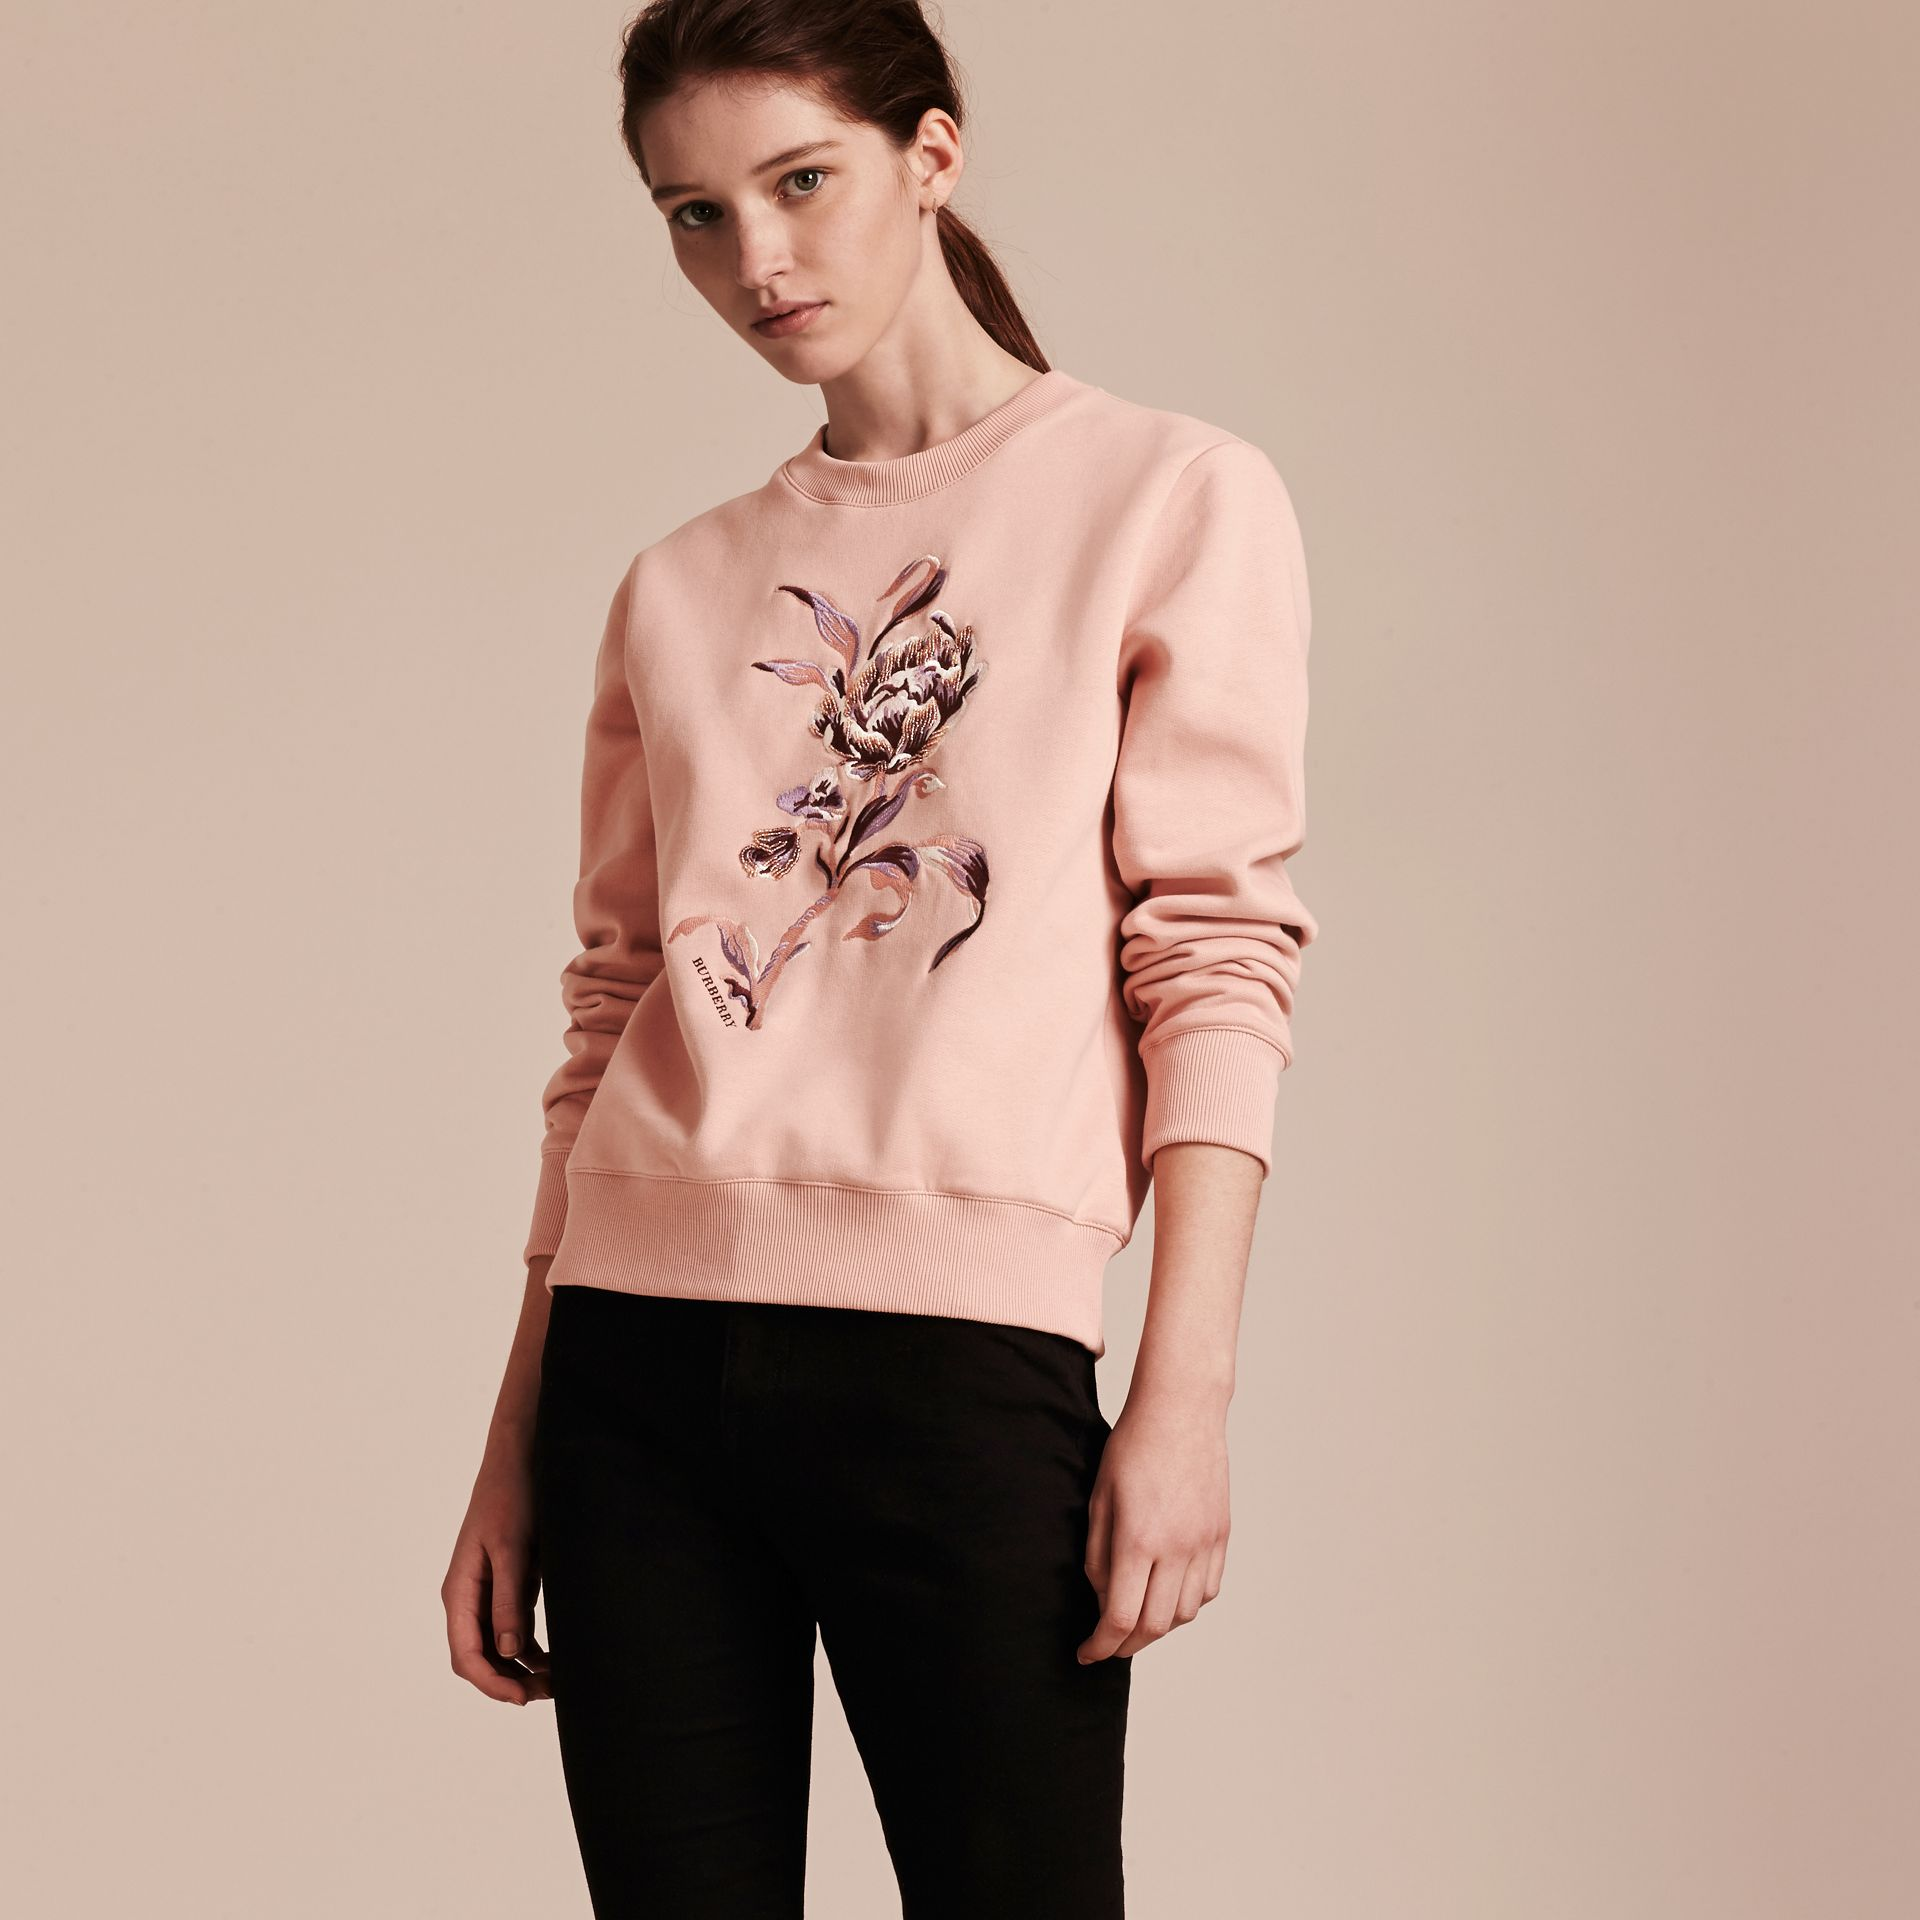 Embroidered Floral Motif Cotton Blend Sweatshirt Ash Rose - gallery image 6